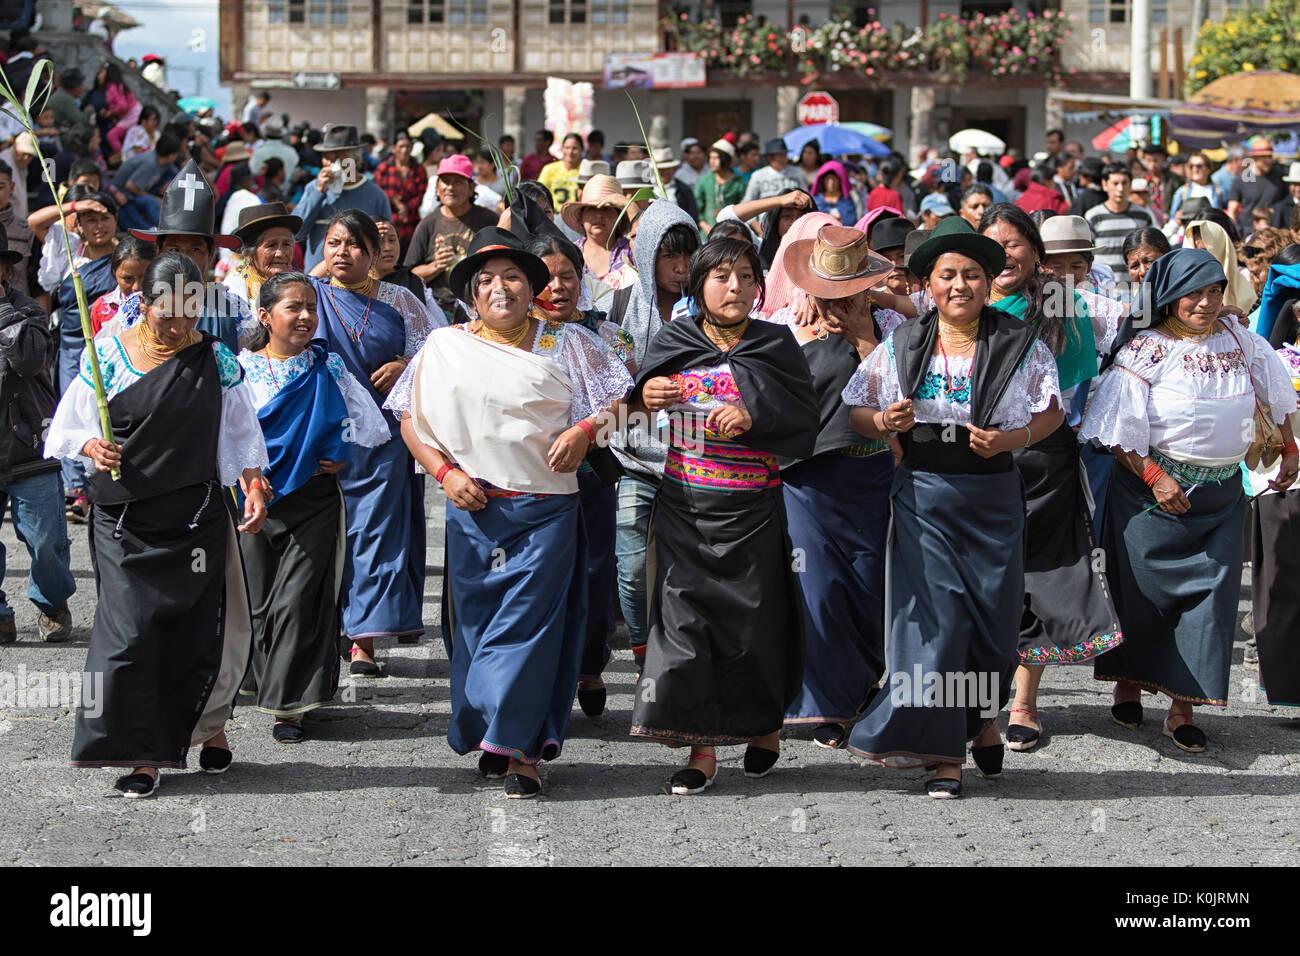 July 1, 2017 Cotacachi, Ecuador: traditionally dressed Kichwa woman portrait during Punchi Warmi celebration - Stock Image